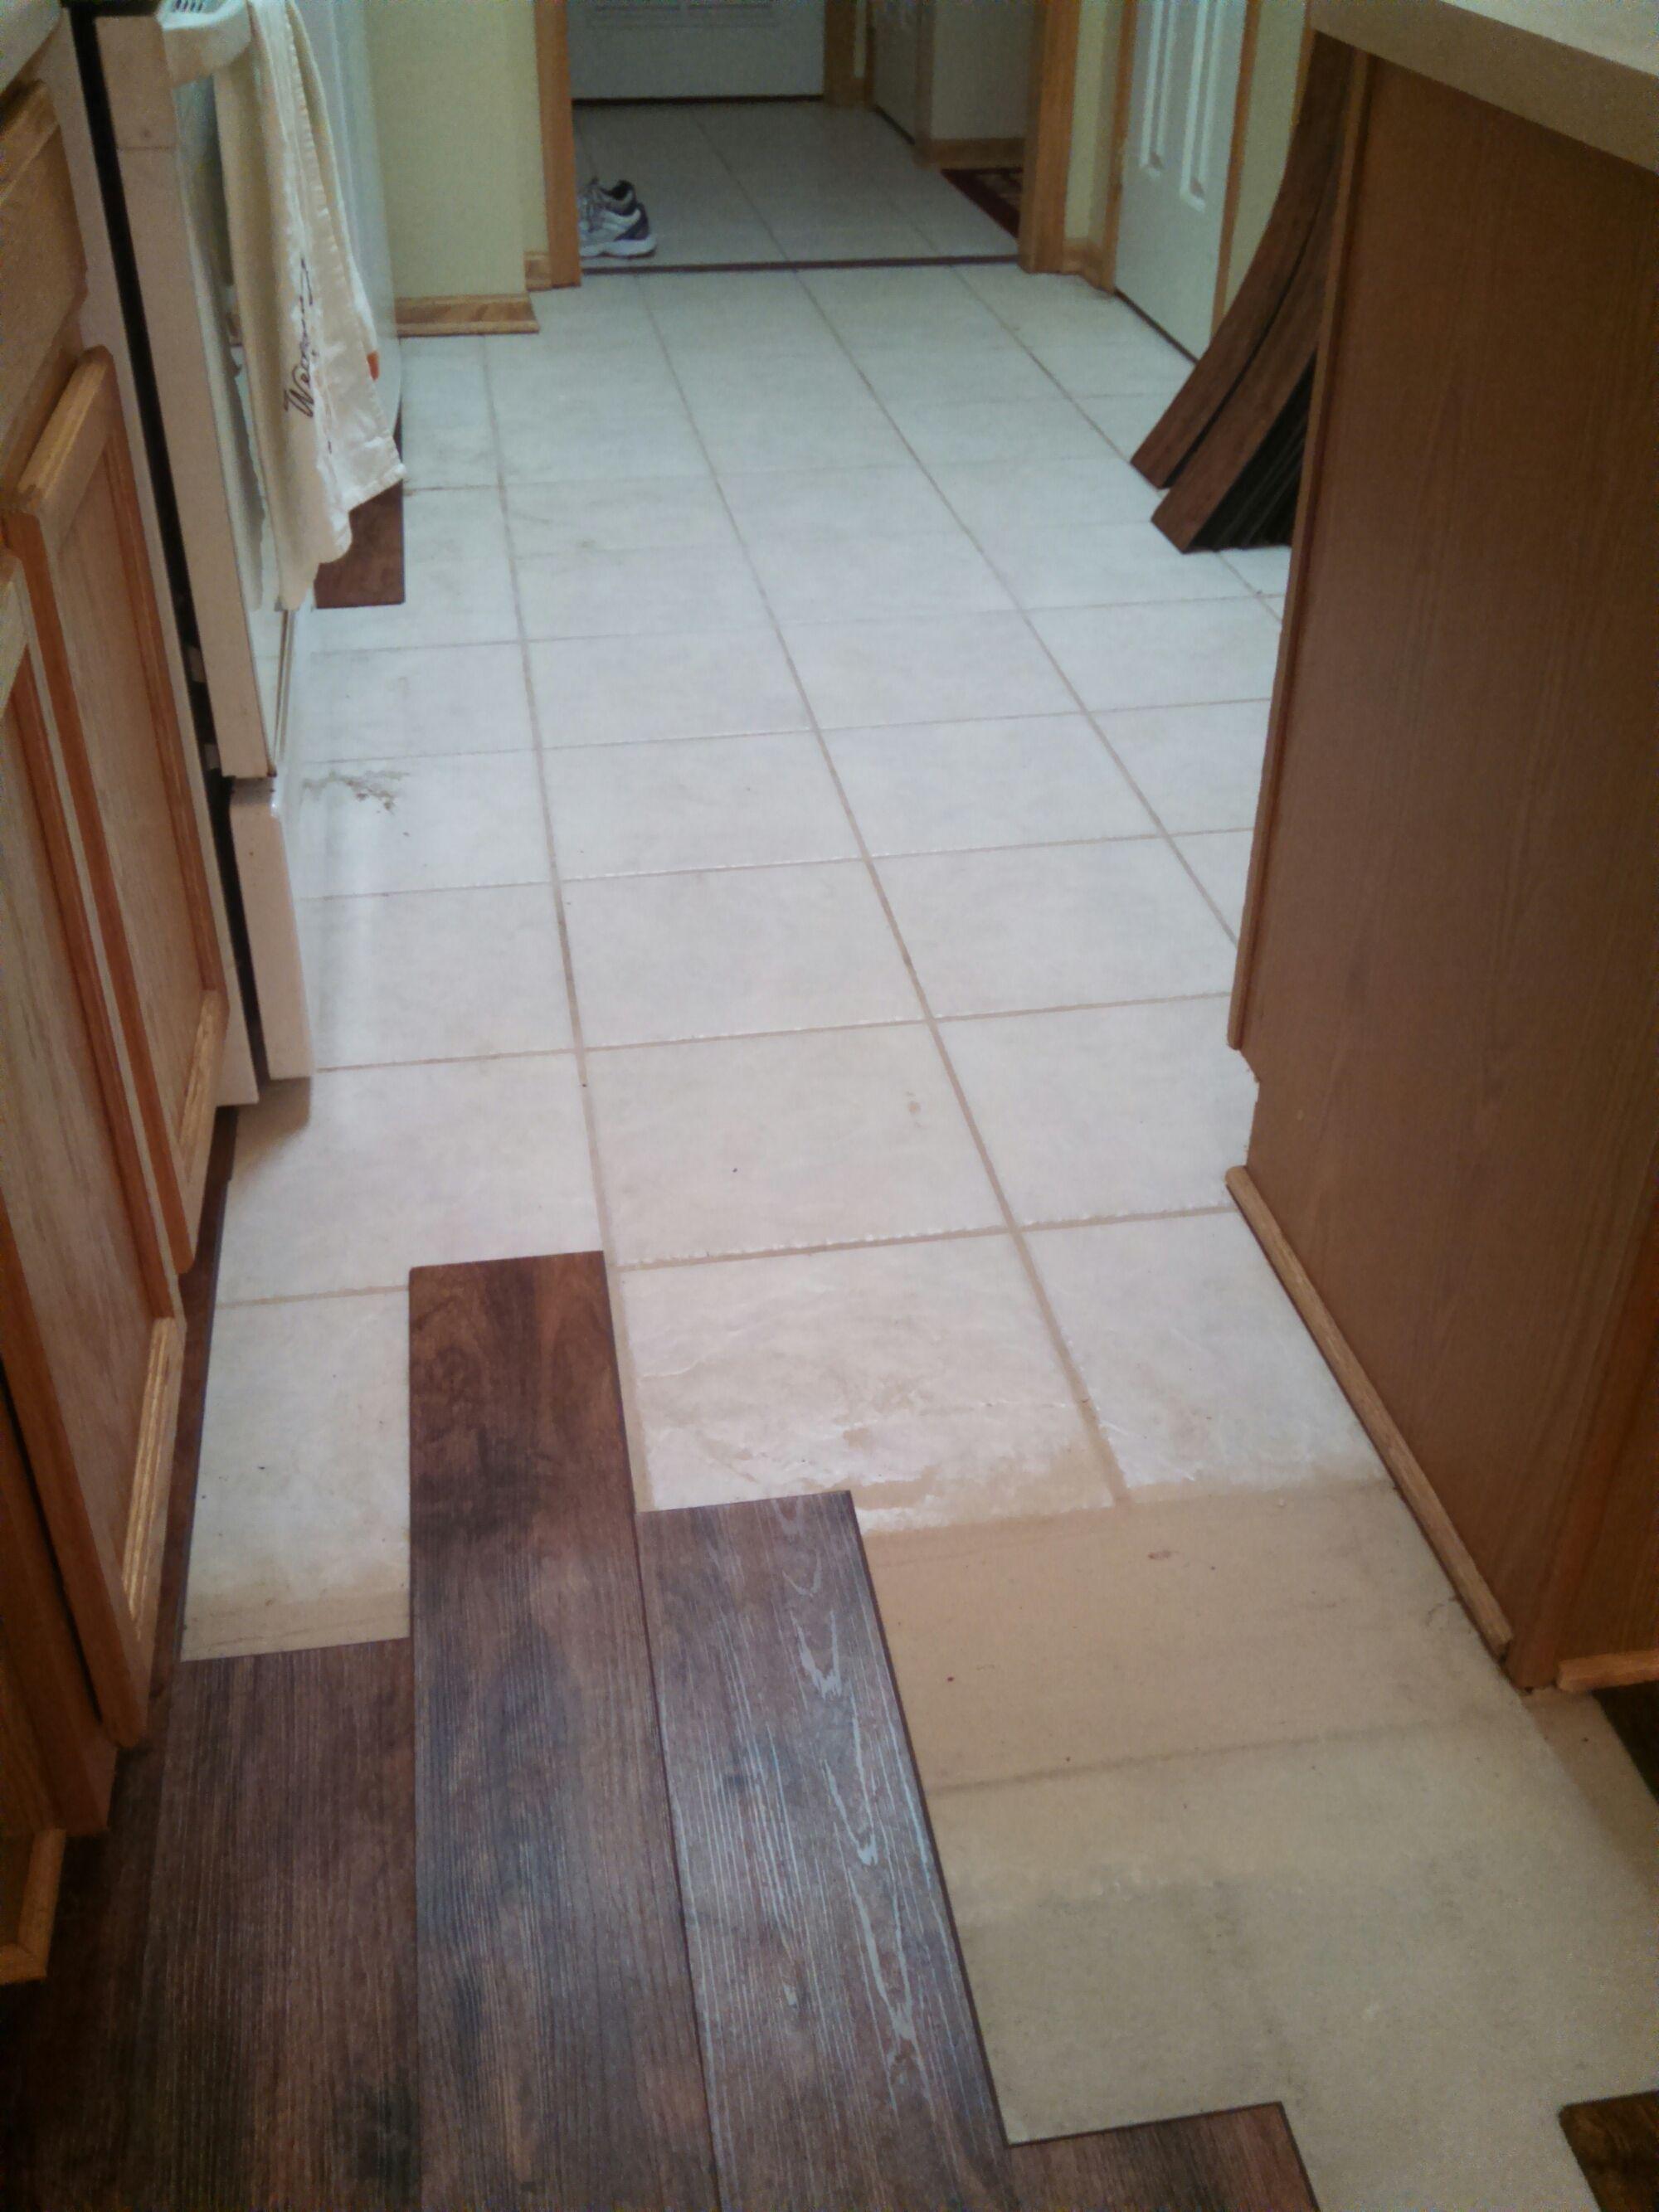 Laying Laminate Wood Flooring Over Ceramic Tile Installing Laminate Wood Flooring Laying Wood Floors Wood Laminate Flooring